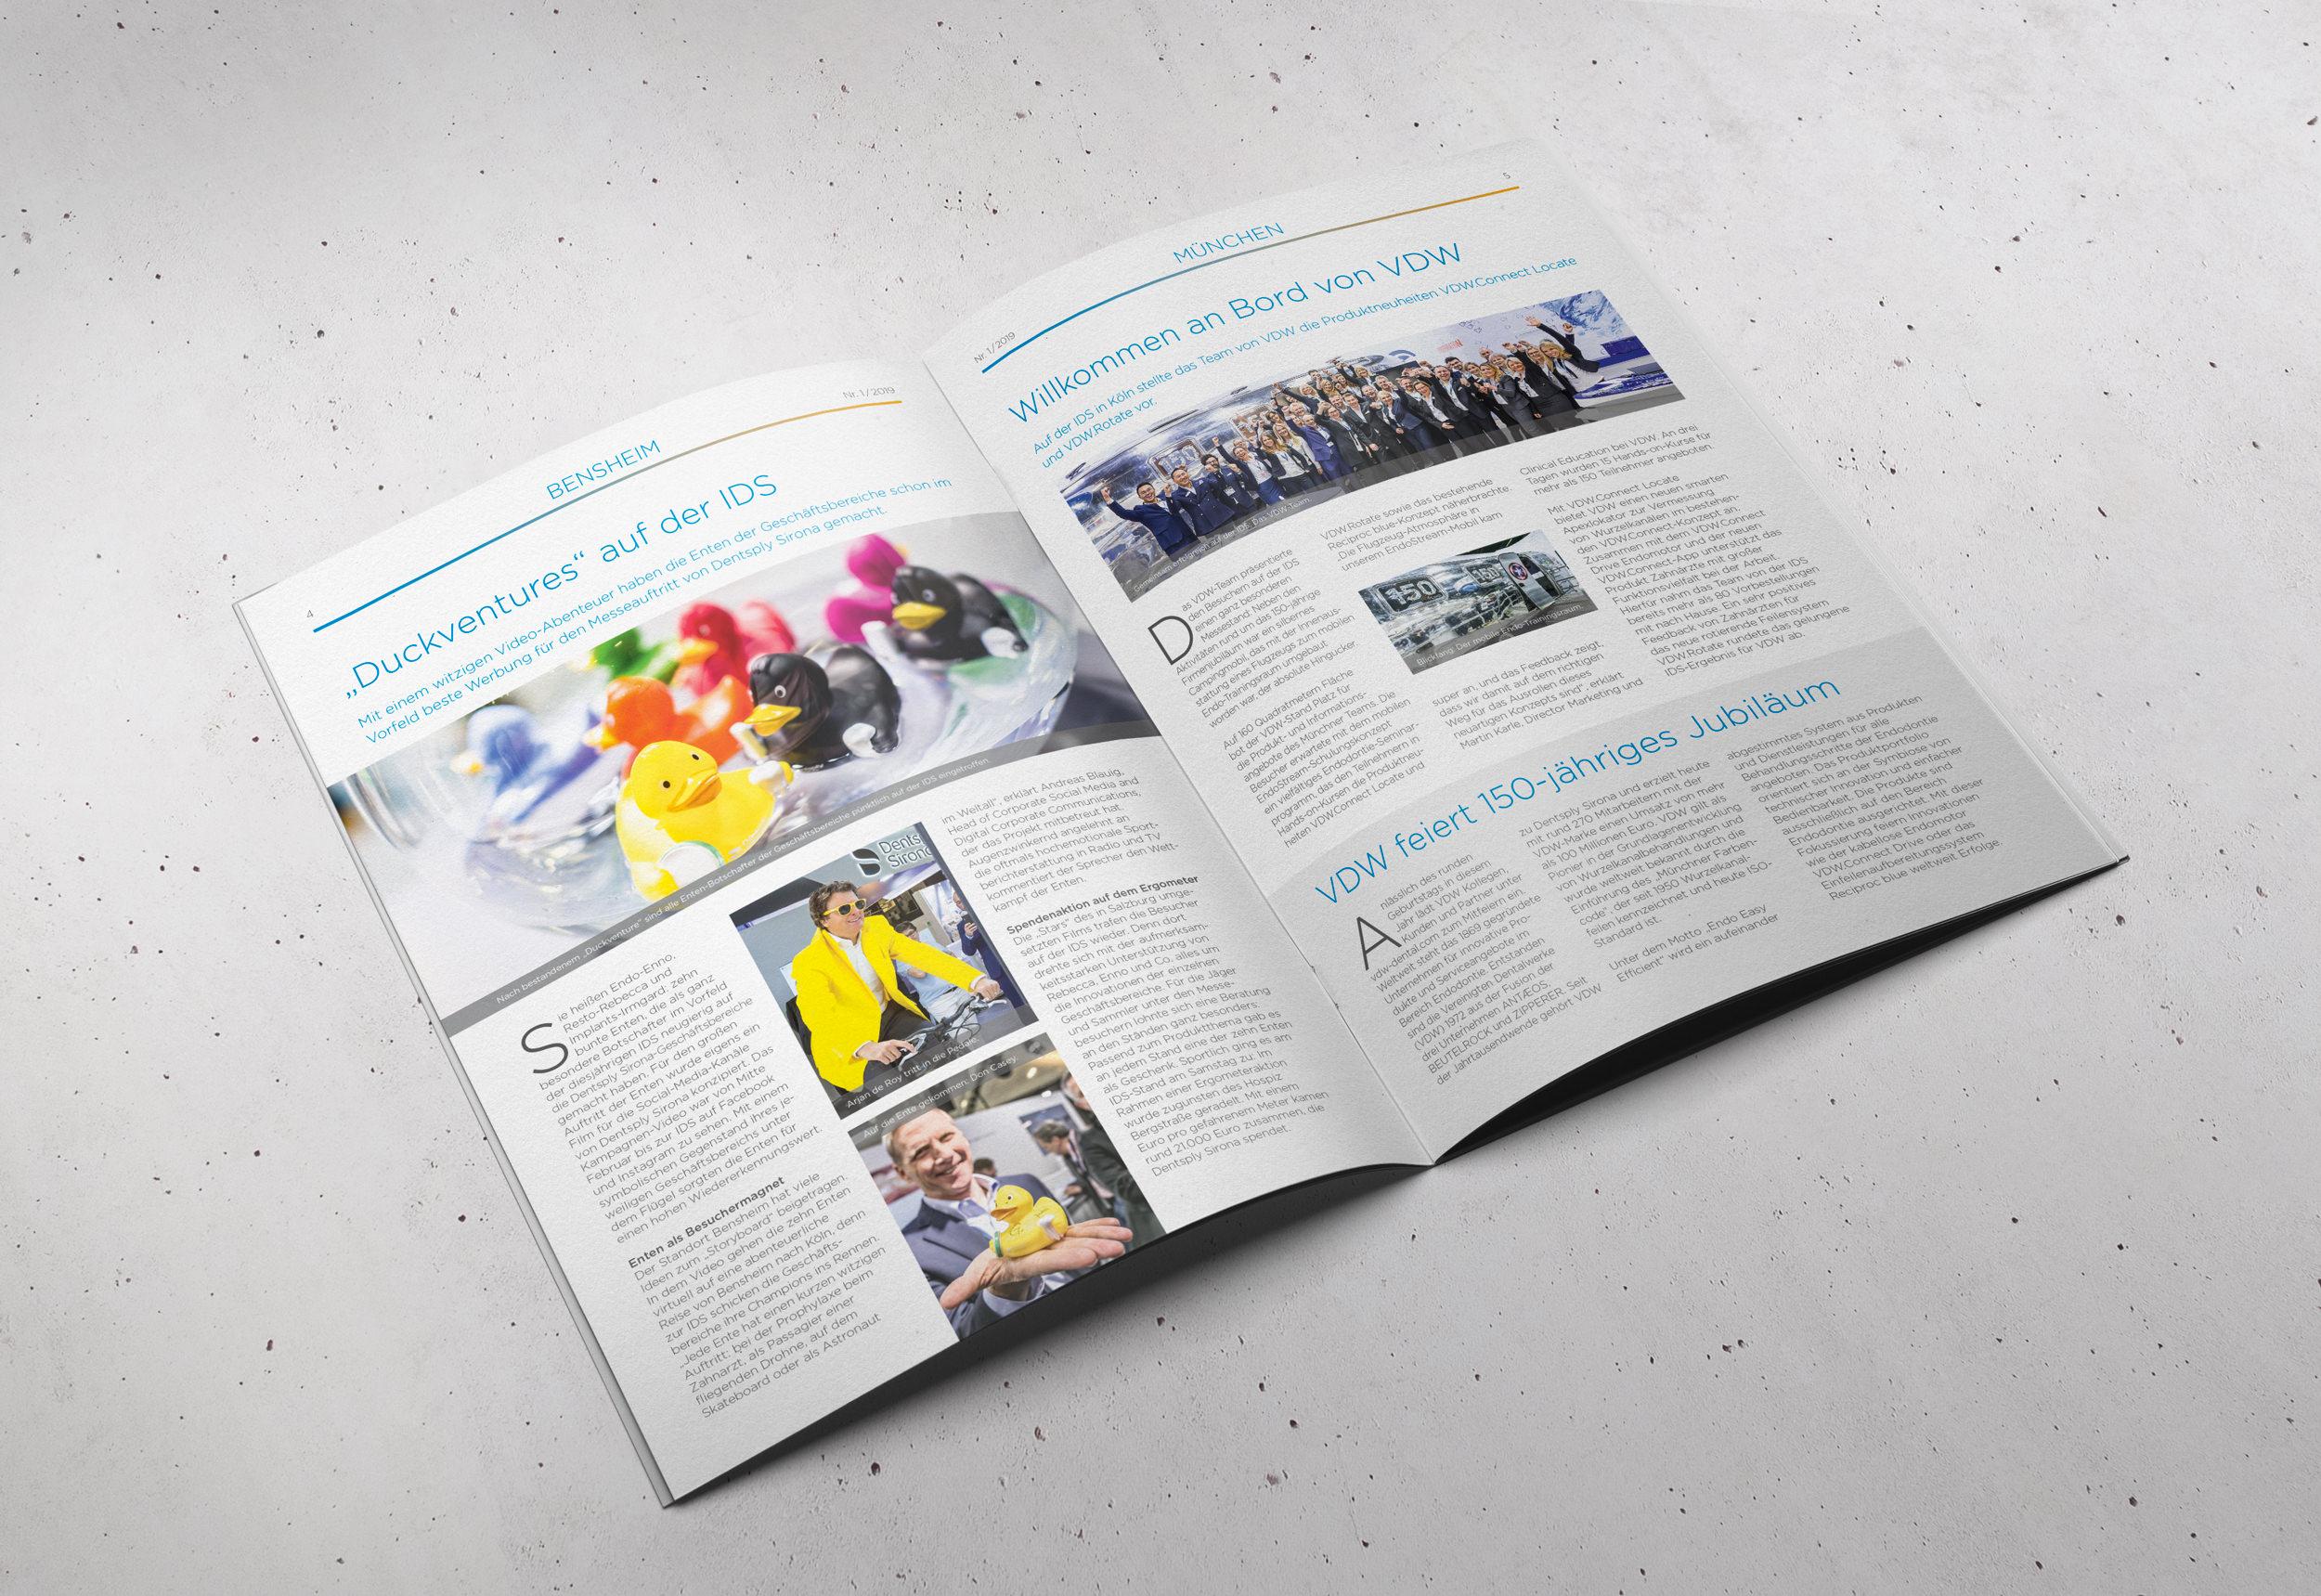 Dentsply Sirona – Magazin Spotlight, Deutschland-Ausgabe | Editorial Design, Corporate Publishing